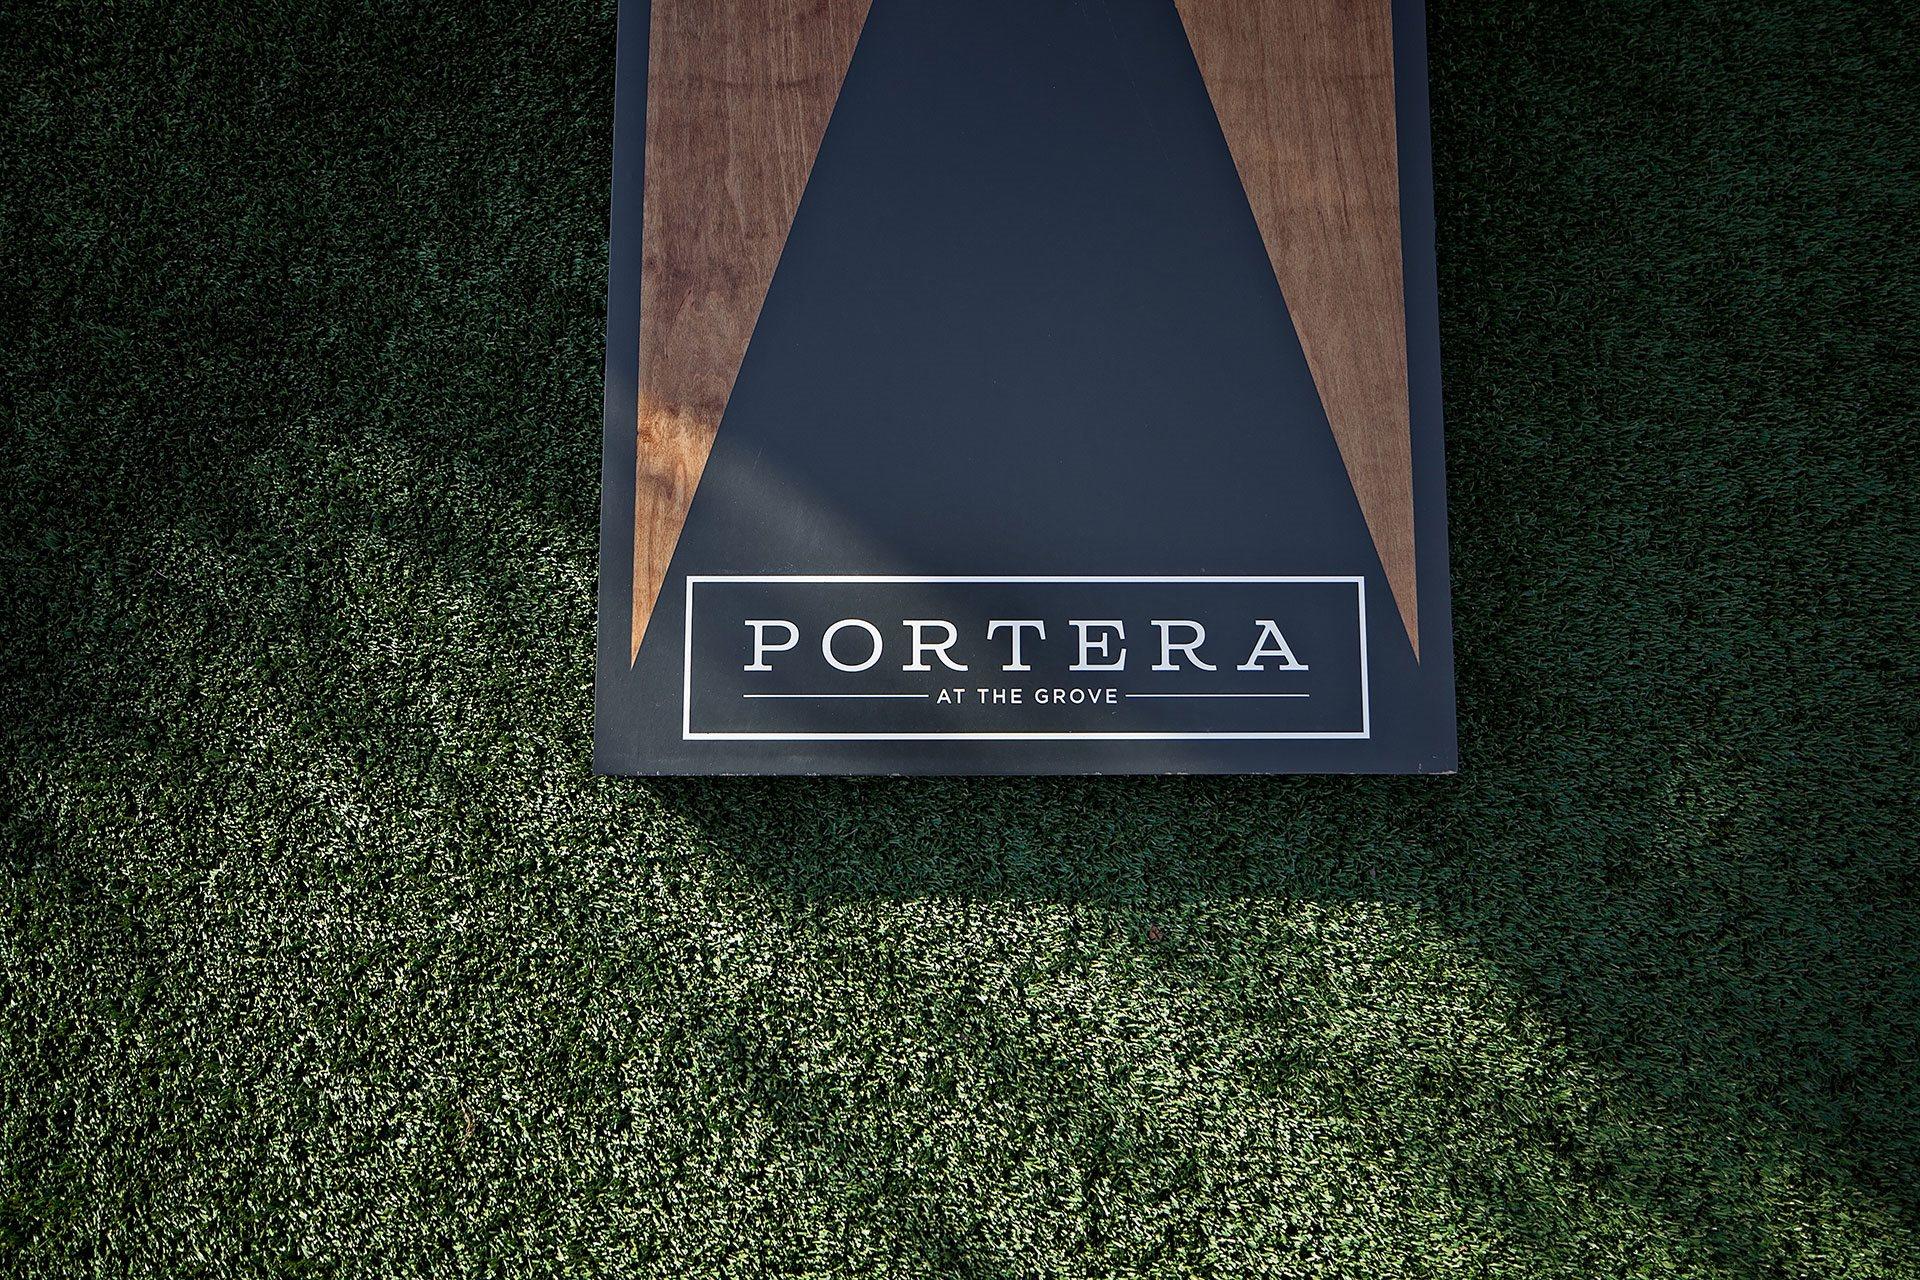 Portera at the Grove_Wilsonville  Corn hole